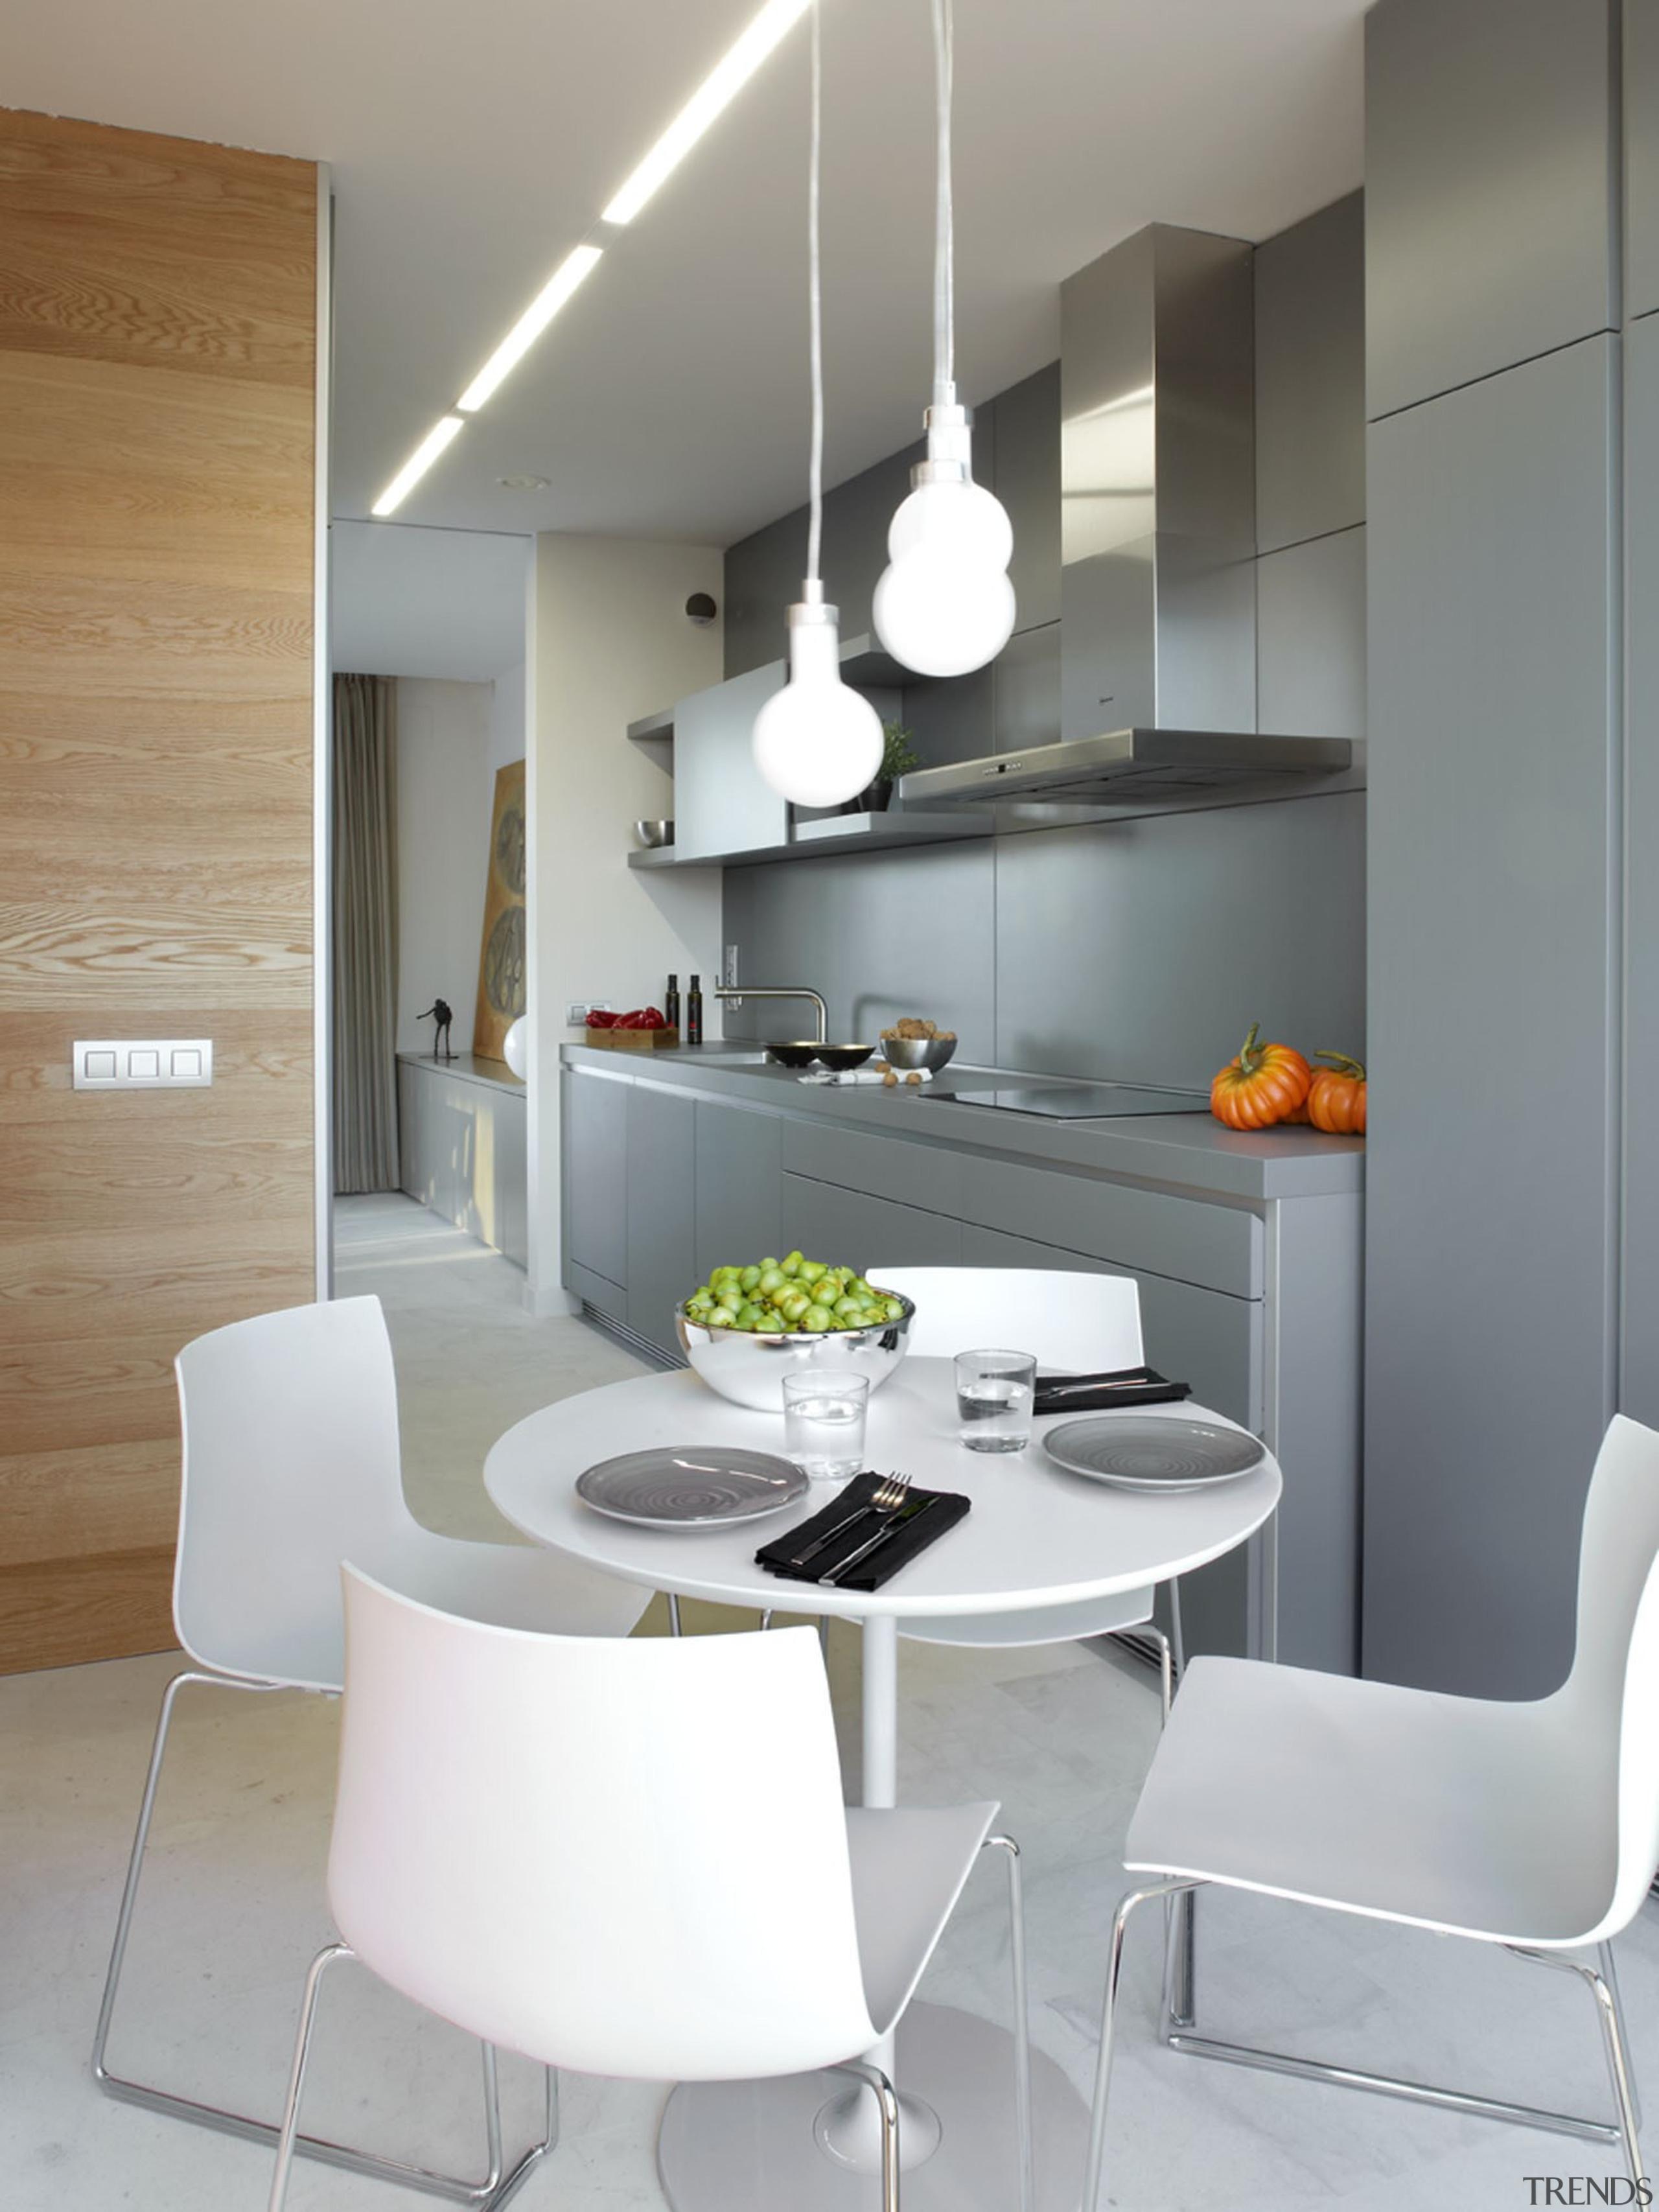 Encimera Kensho - Encimera Kensho - countertop | countertop, dining room, furniture, interior design, interior designer, kitchen, light fixture, product design, table, gray